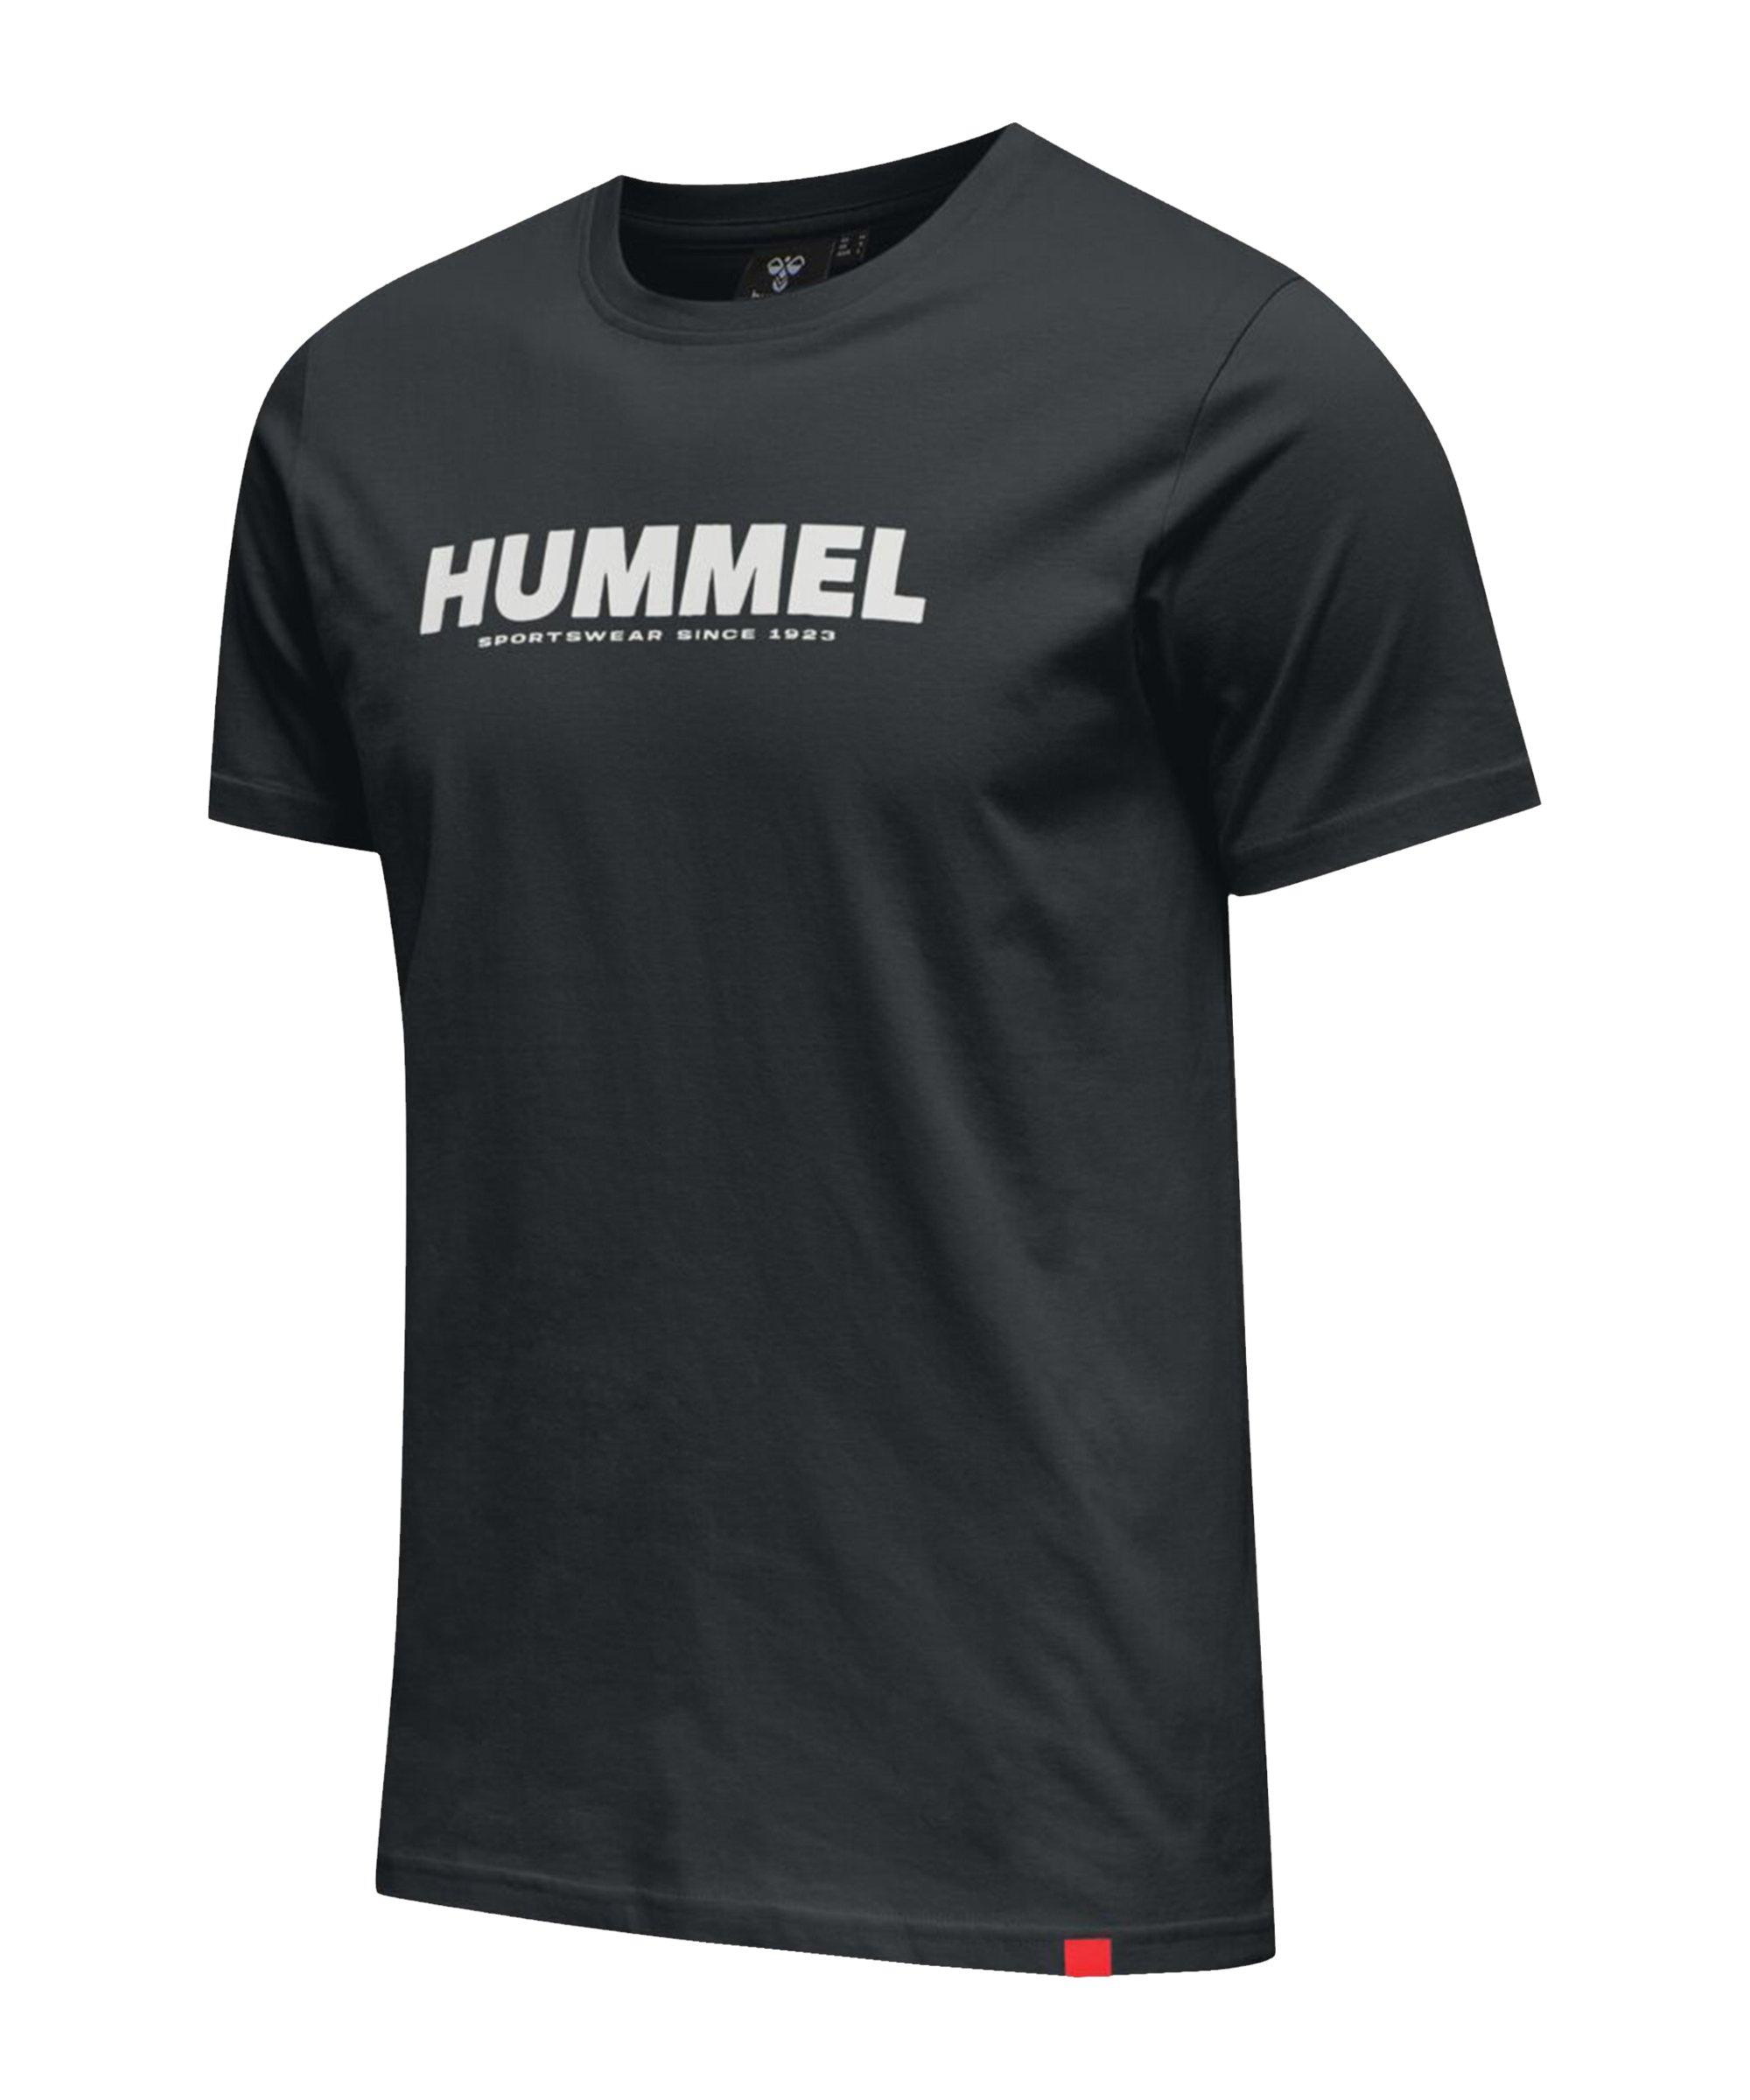 Hummel Legacy T-Shirt Schwarz F2001 - schwarz